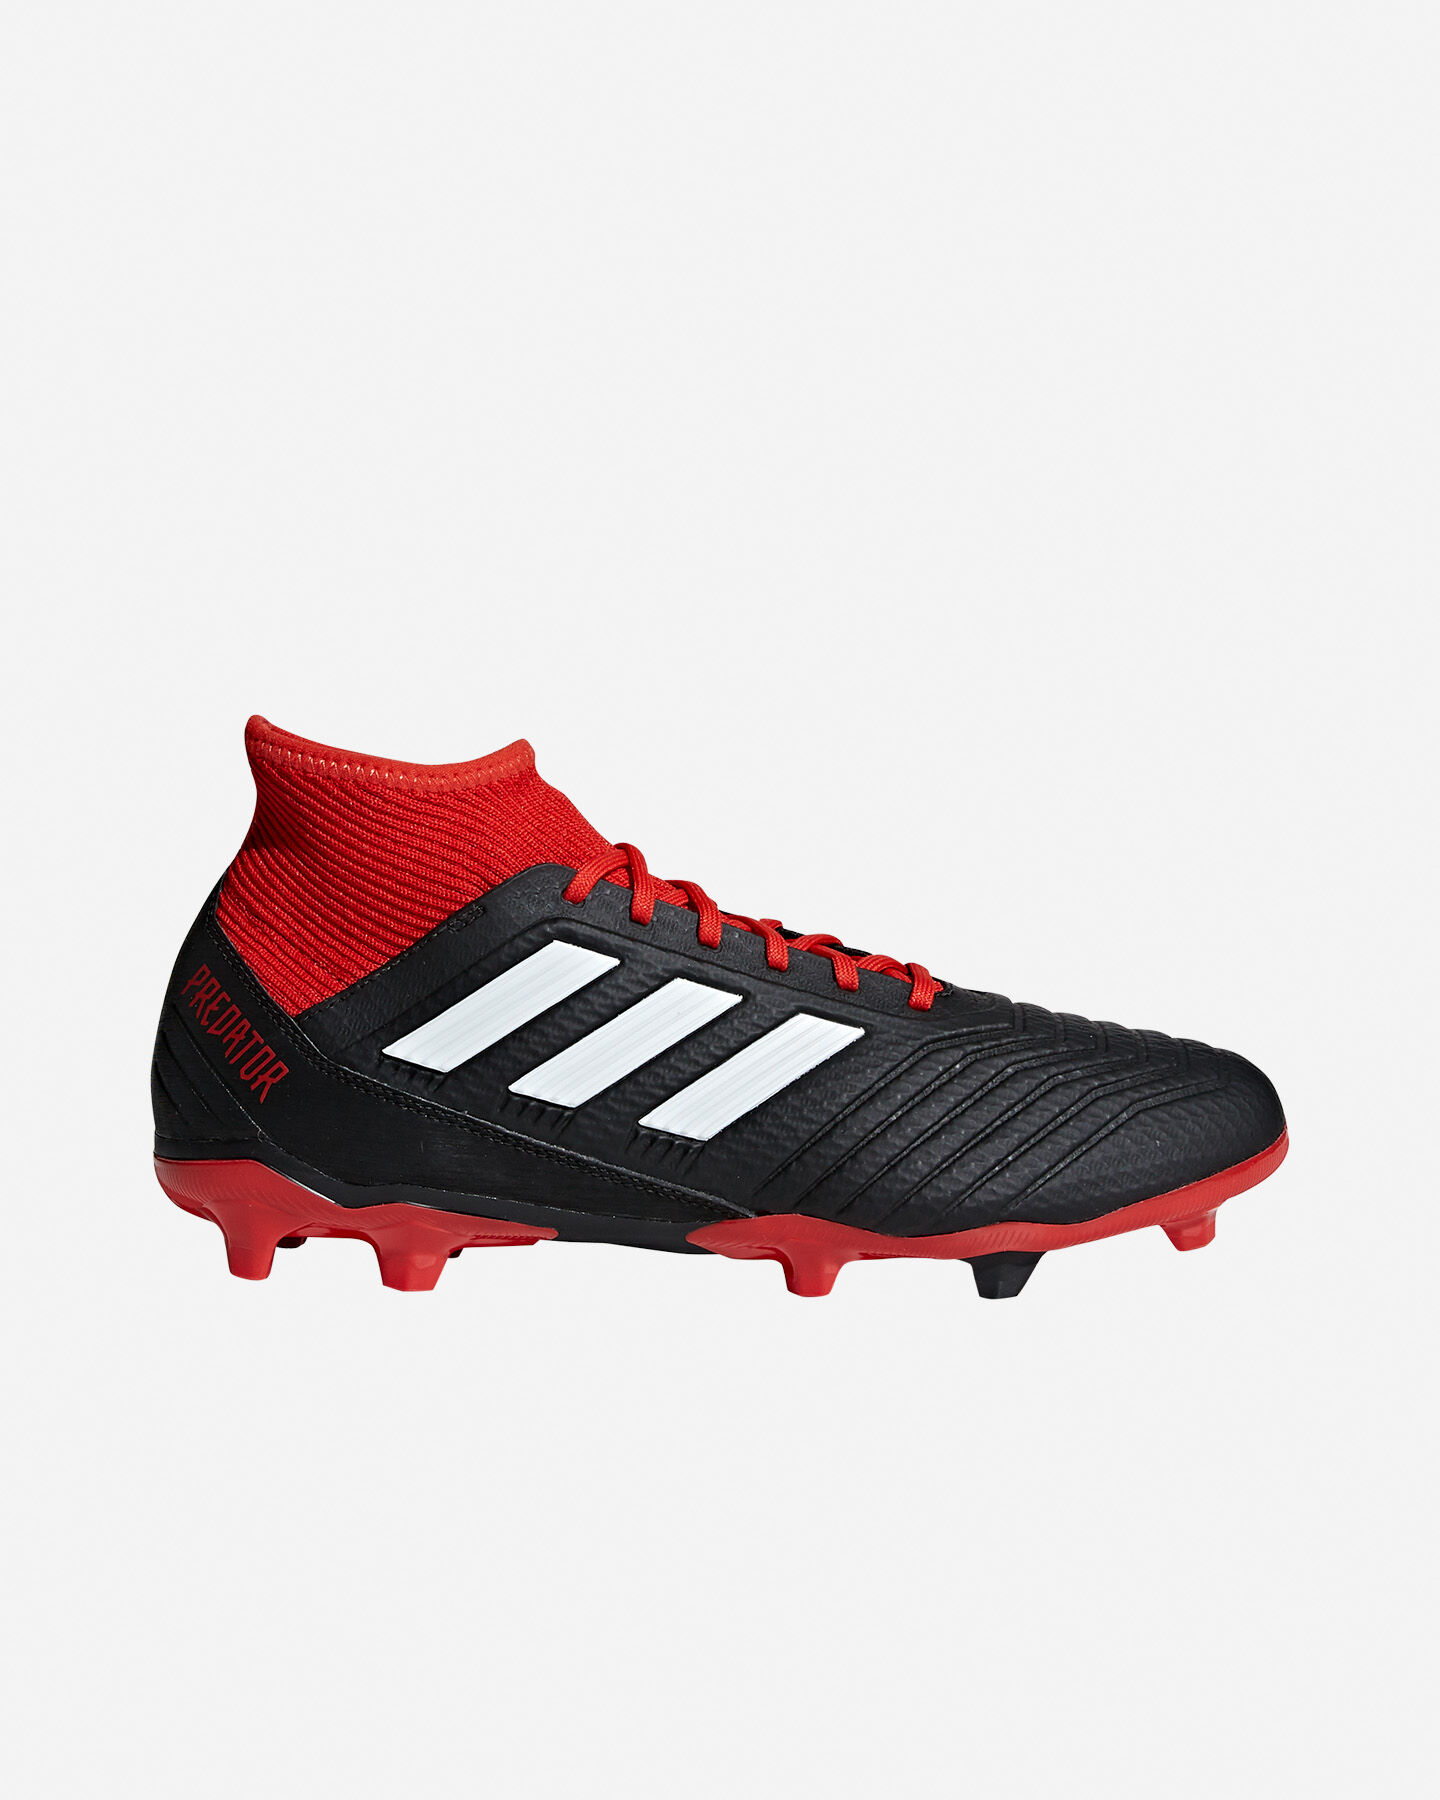 E Scarpe Da Sport Cisalfa Calcetto Adidas Calcio wgFEx6qFOS